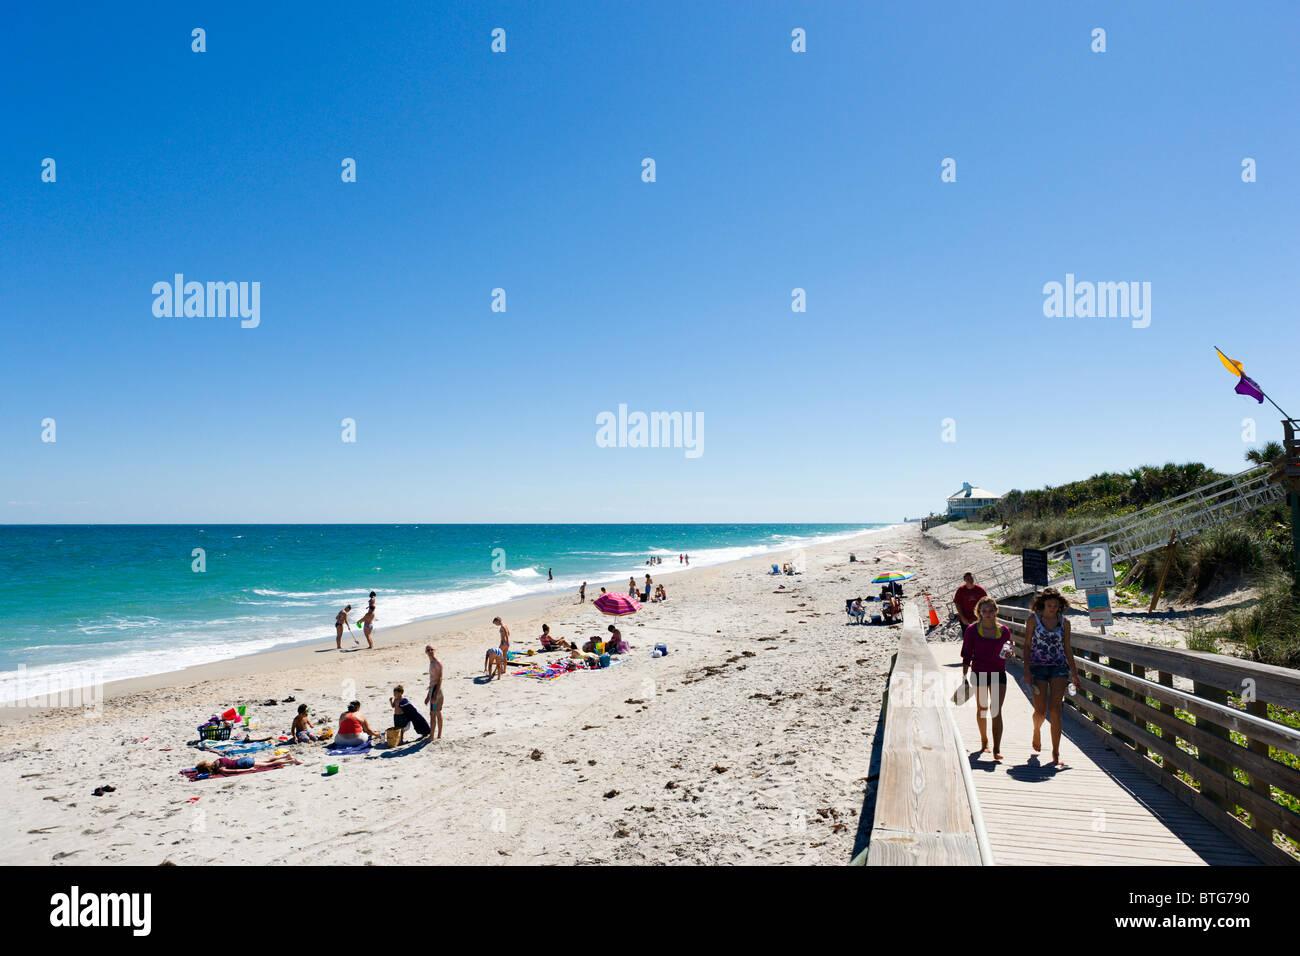 Golden Sands Park beach, north of Vero Beach, Treasure Coast, Florida, USA - Stock Image